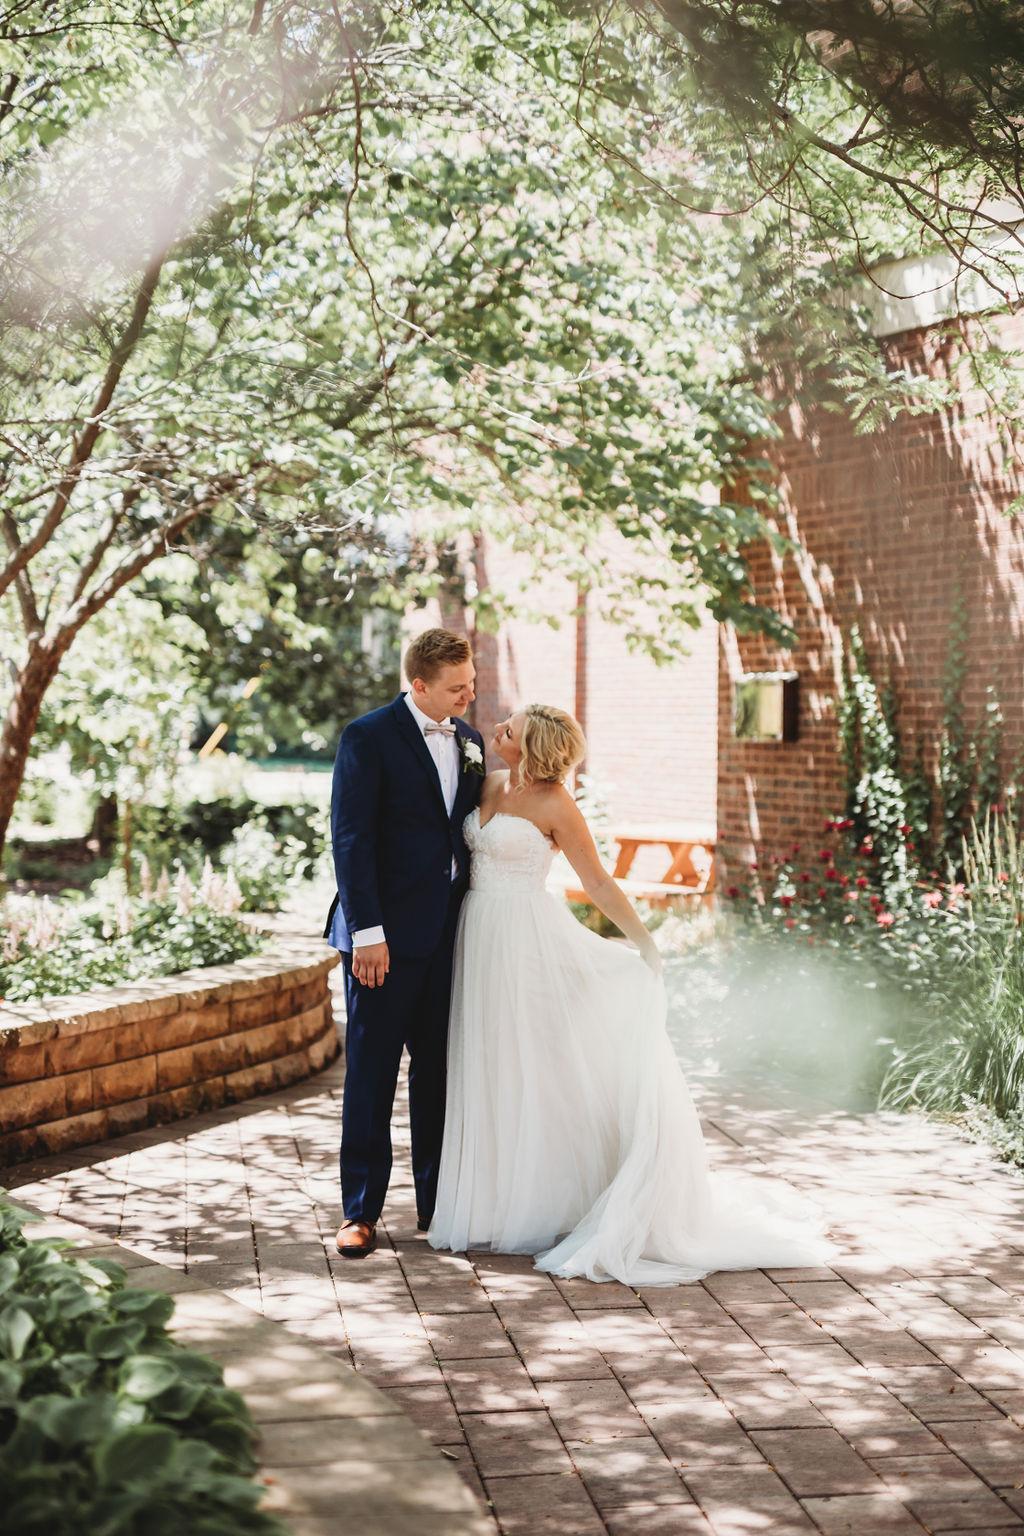 engle-olson-katie-dalton-wedding-clewell-photography-24.jpg